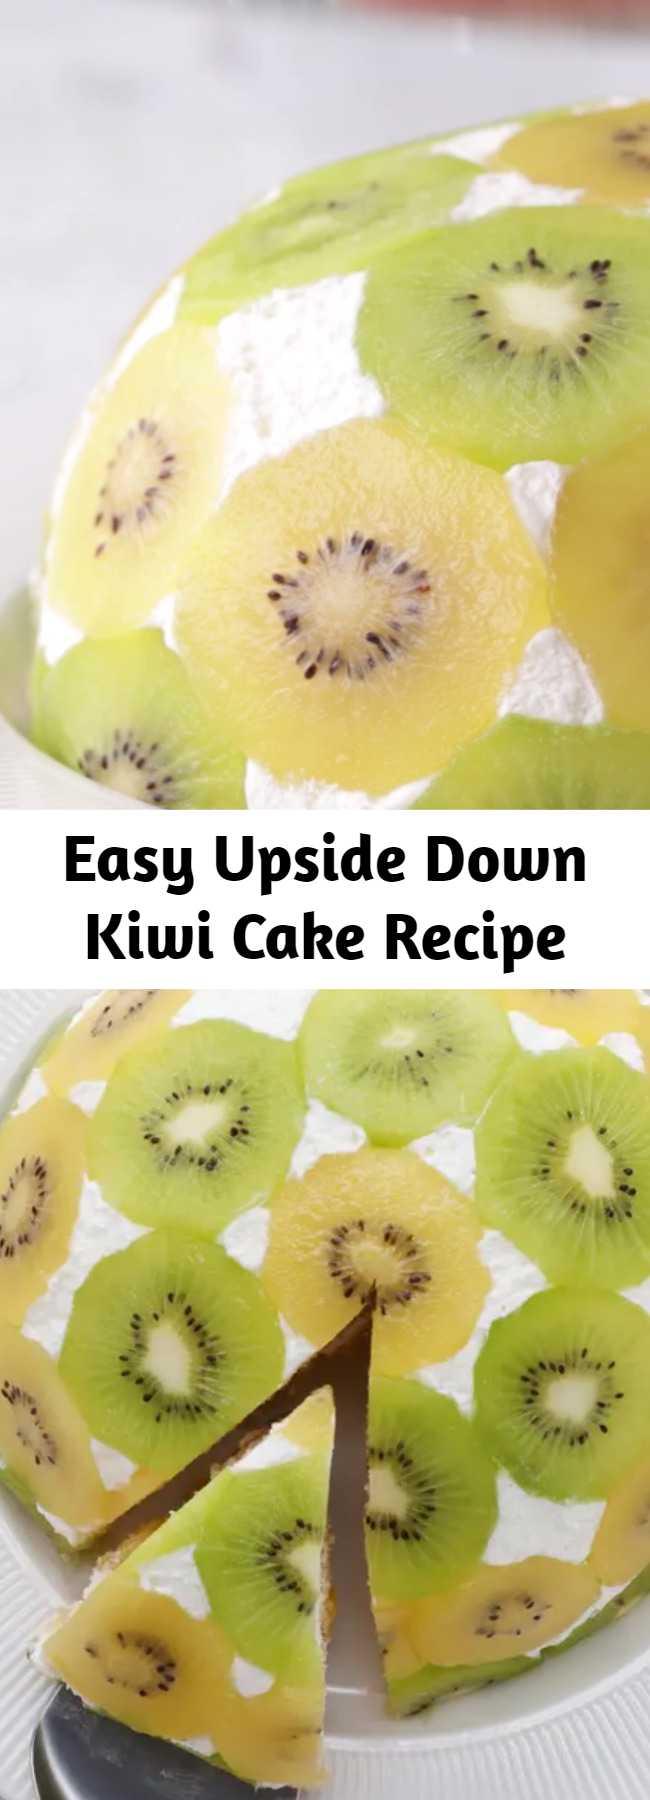 Easy Upside Down Kiwi Cake Recipe - This Upside Down Kiwi Cake looks amazing and taste even Better!!